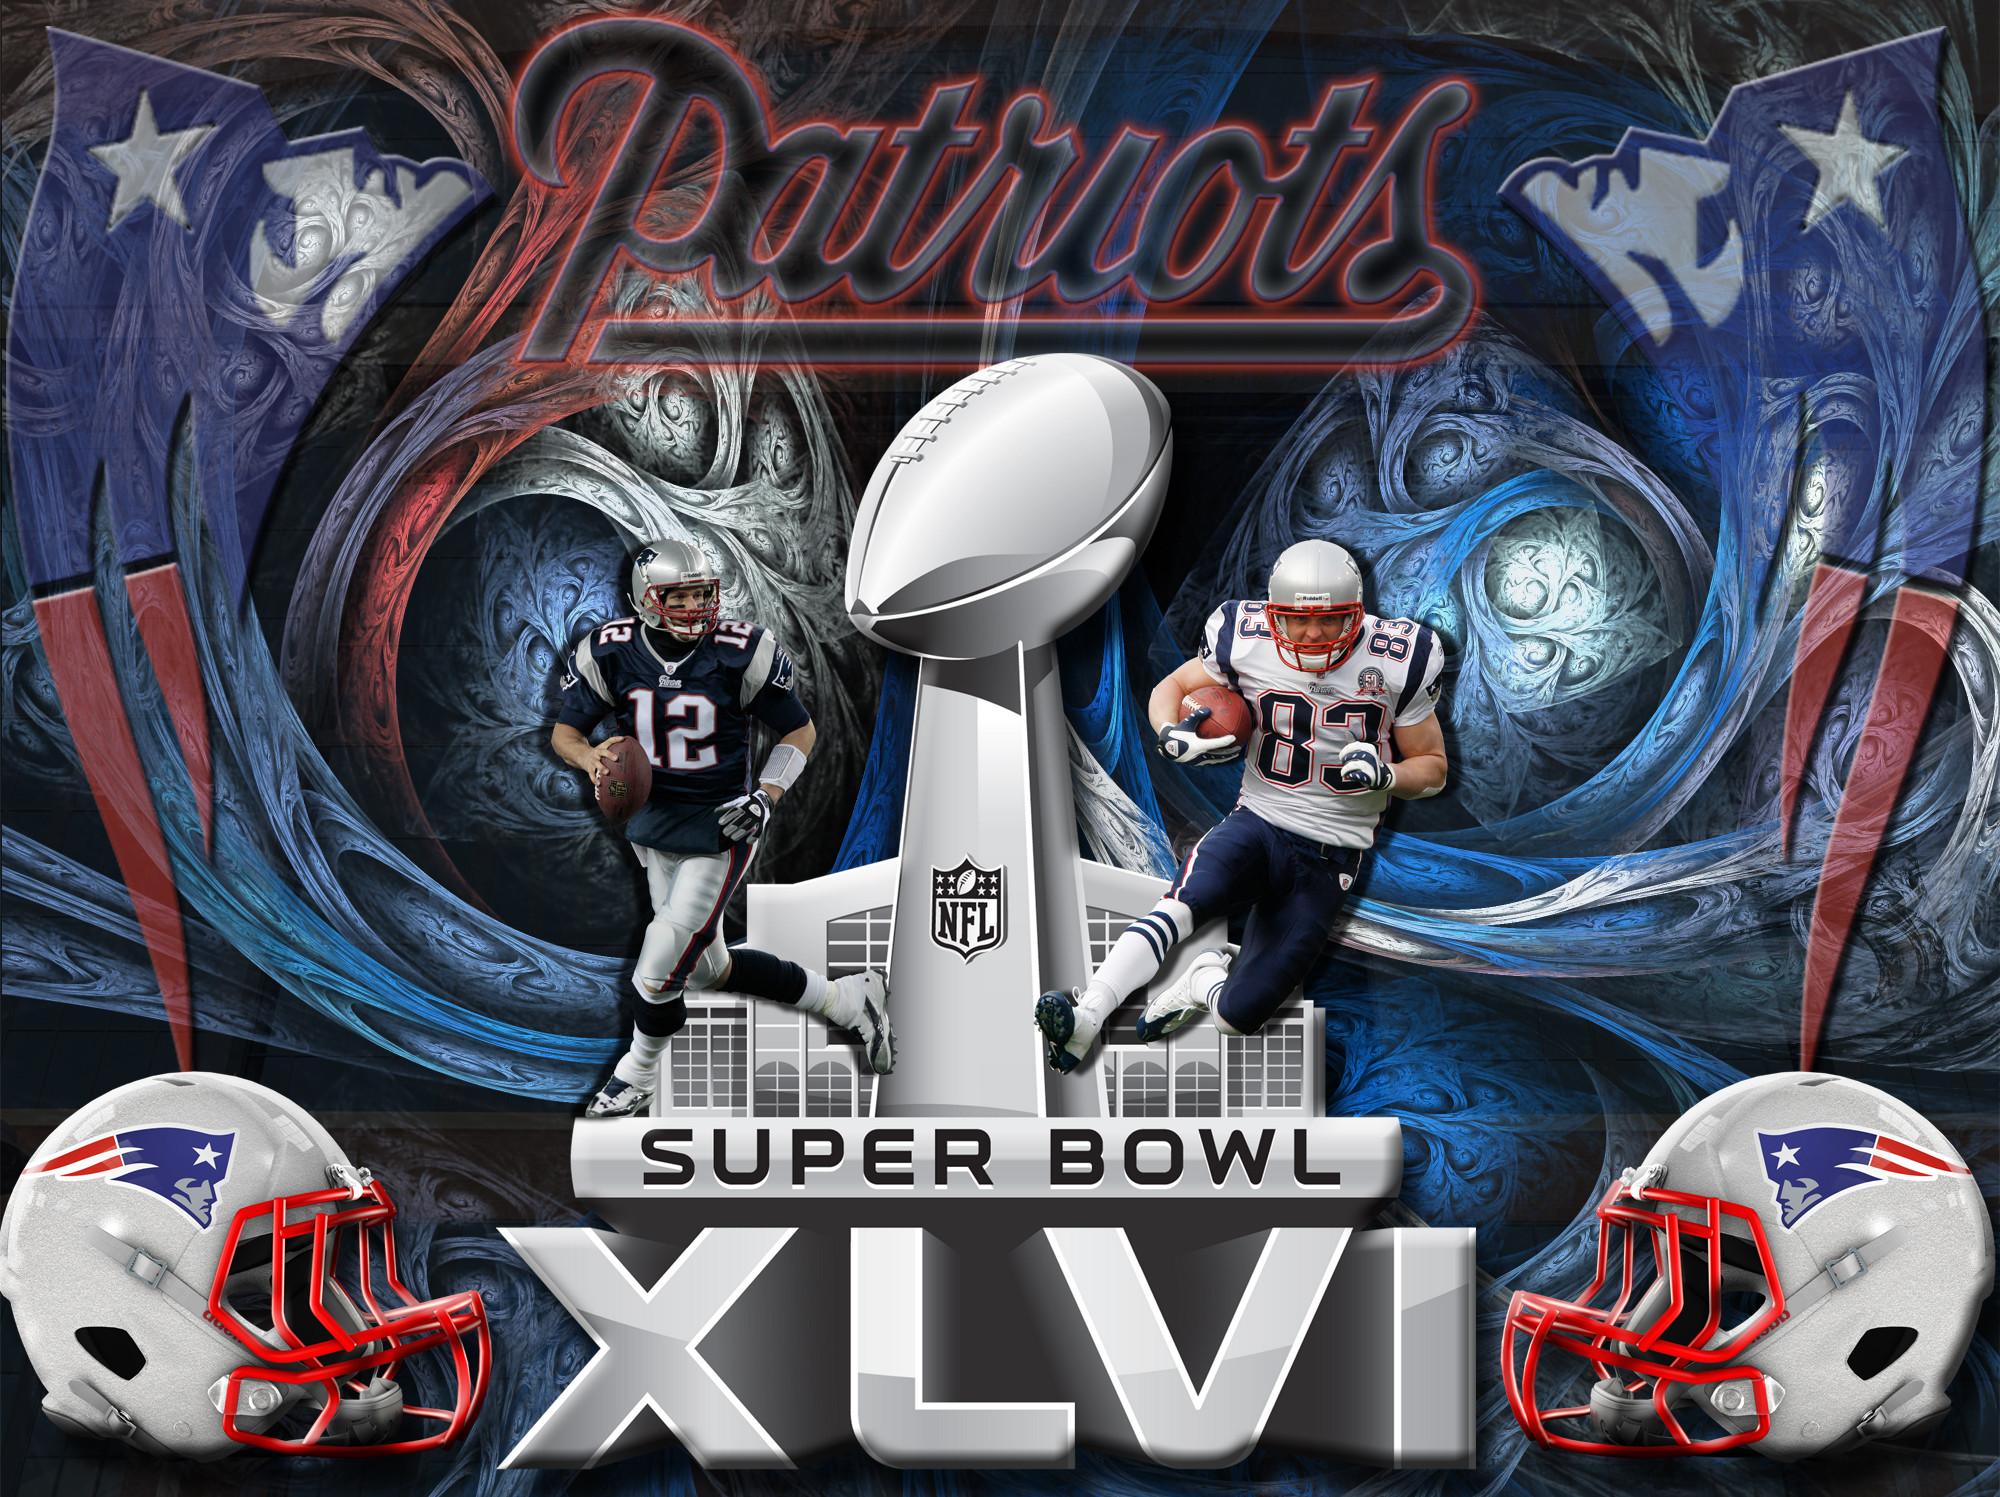 Super bowl 2018 wallpapers 65 pictures - Patriots super bowl champs wallpaper ...